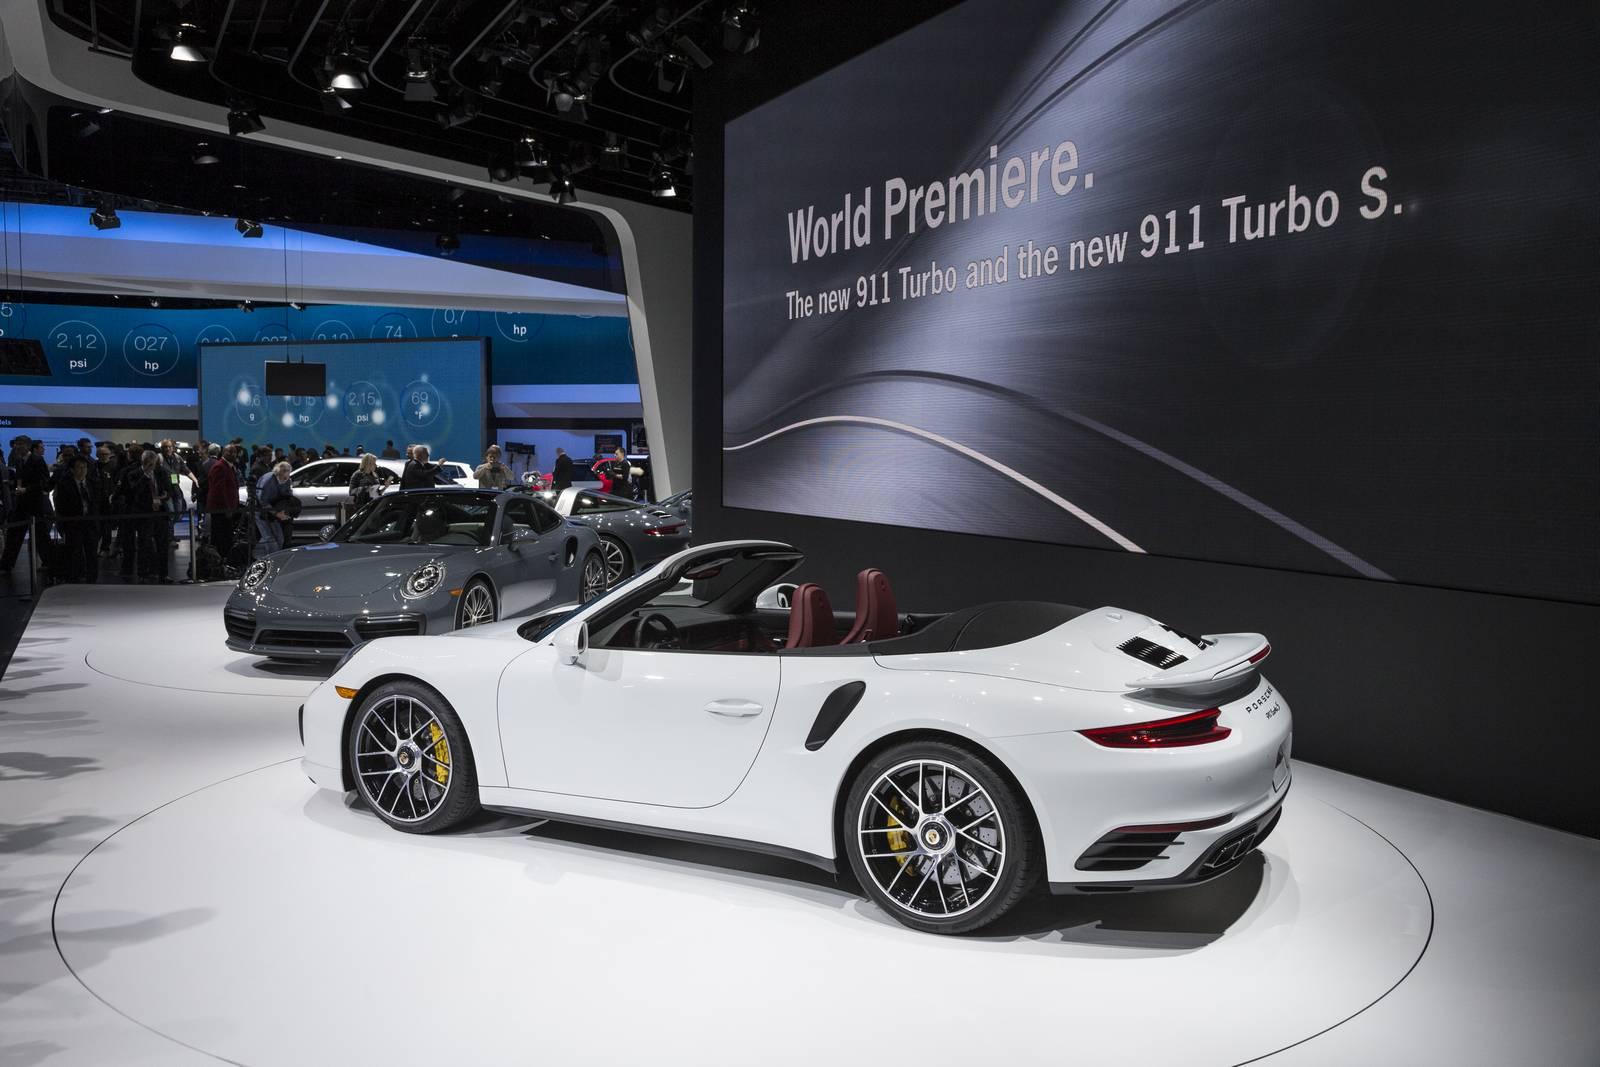 Detroit 2016: Porsche 911 Turbo and Turbo S - GTspirit on blue 911 turbo, 2005 porsche cayenne turbo, 2017 porsche boxster, 2016 porsche cayenne turbo, 2017 porsche cayenne, 2017 porsche panamera turbo, 2017 porsche panamera convertible, 2017 porsche roadster, 2017 porsche 918 spyder, 2017 porsche 918 turbo, 2017 porsche gt2, 2017 porsche panamera 4s, 2017 porsche gt3, 2017 mazda rx-7 turbo, 2017 porsche panamera gts, 2017 porsche cayman, 2017 ford focus turbo,